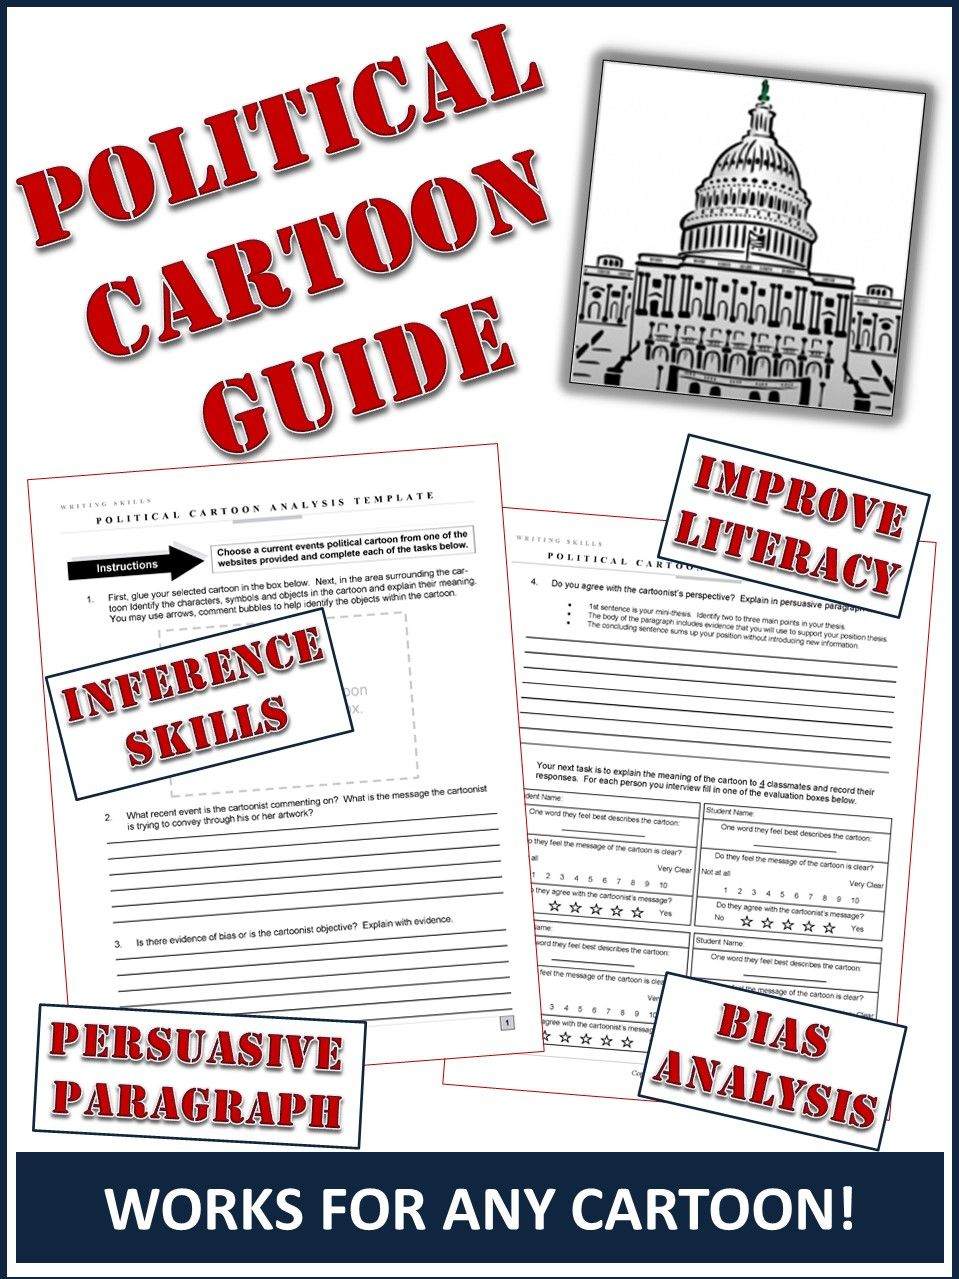 student political cartoons – Analyzing Political Cartoons Worksheet